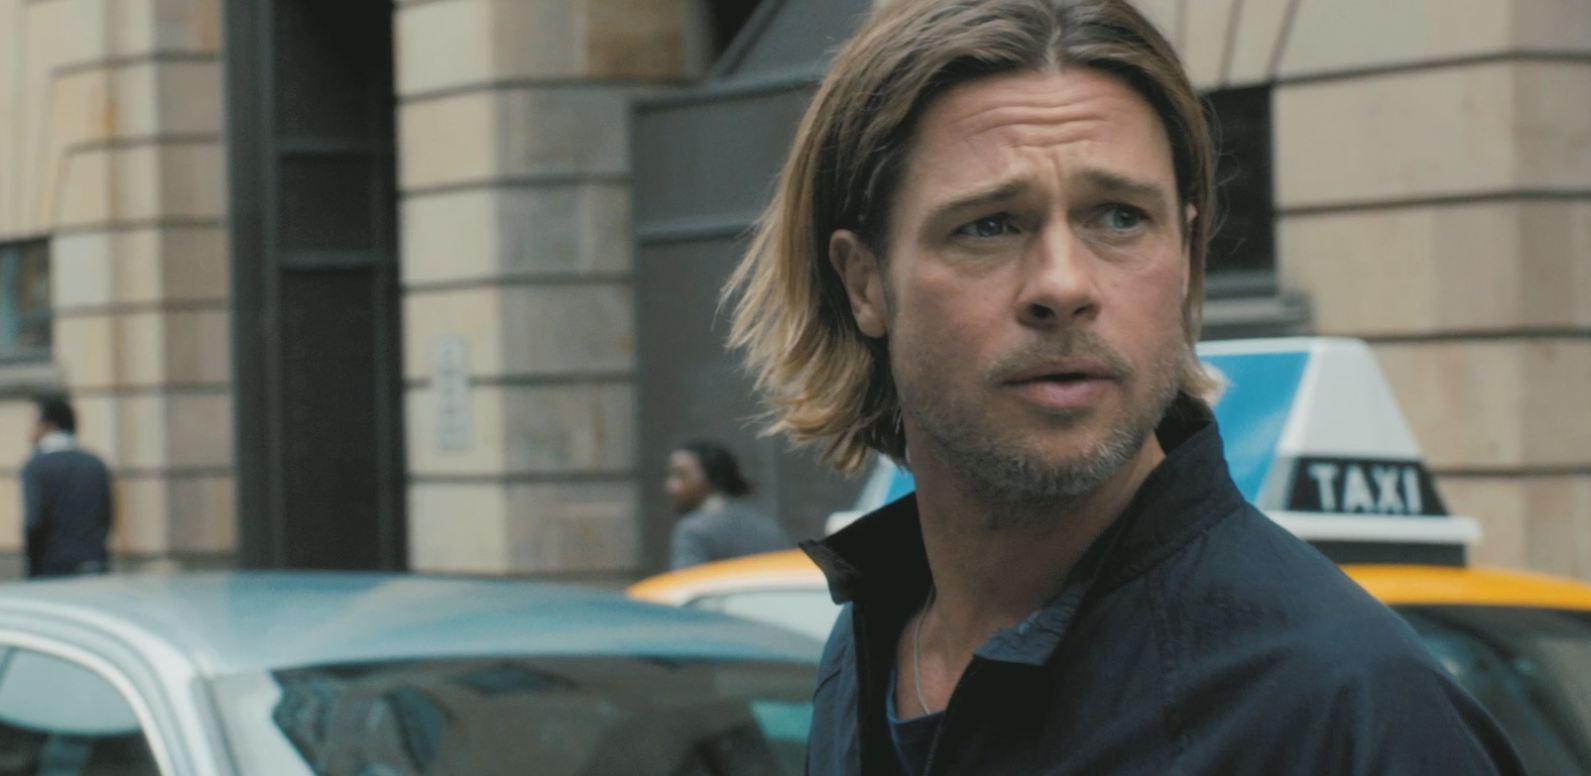 Brad-Pitt-in-World-War-Z-2013-Movie-Image-2.jpg